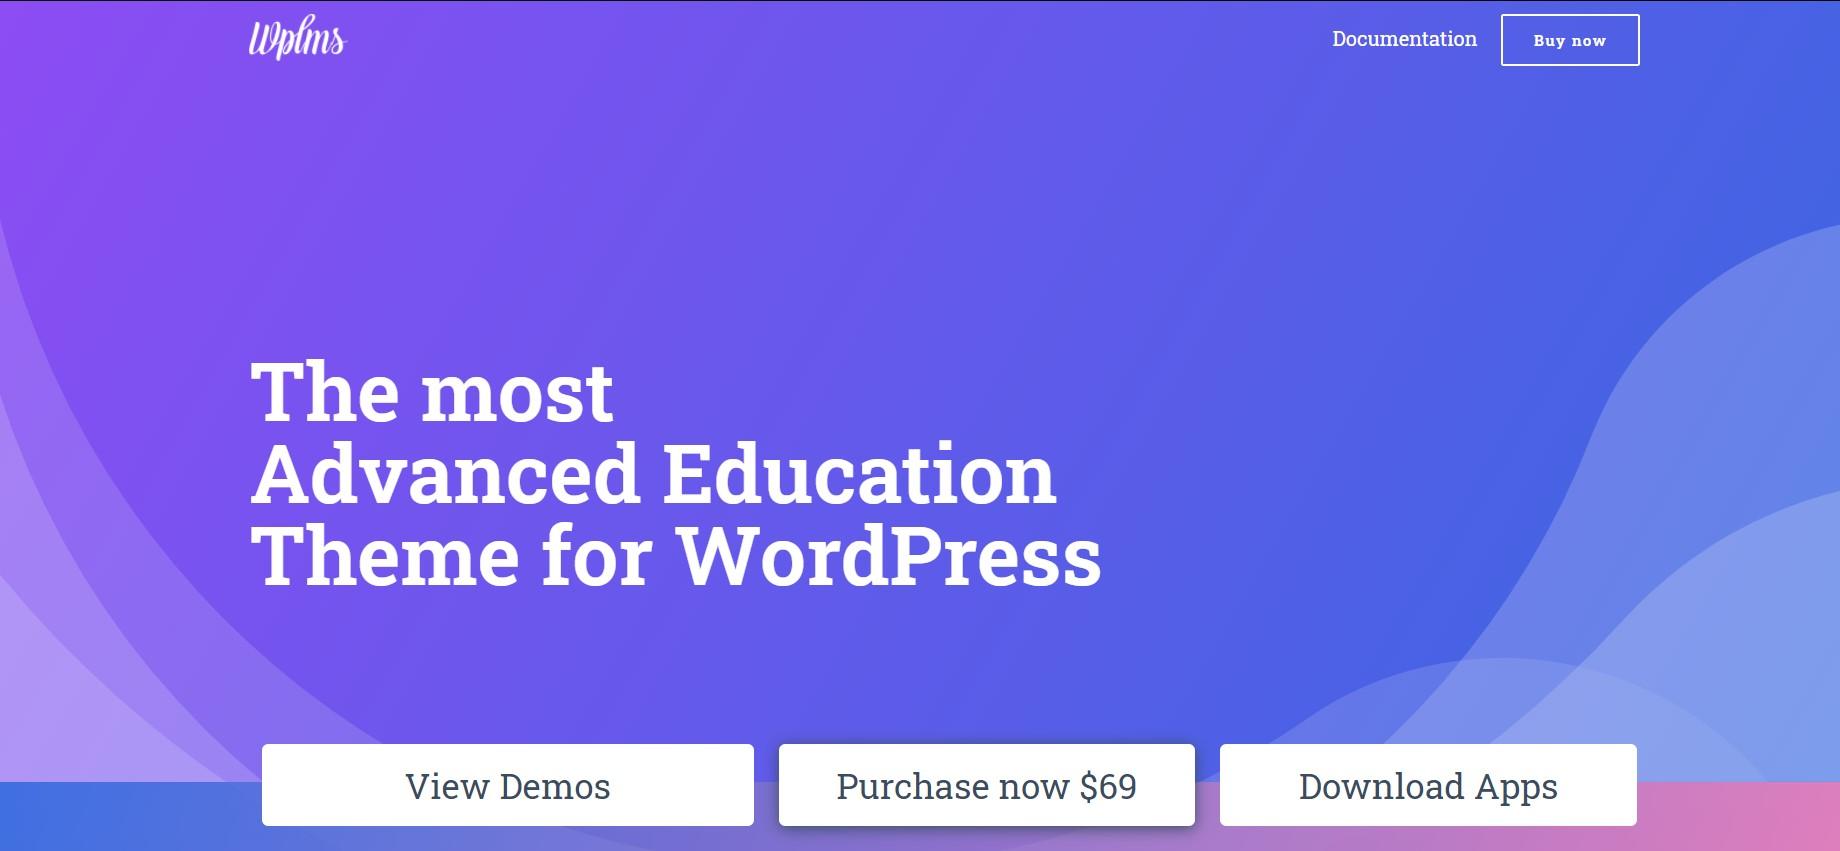 WPLMS wordpress theme for education websites